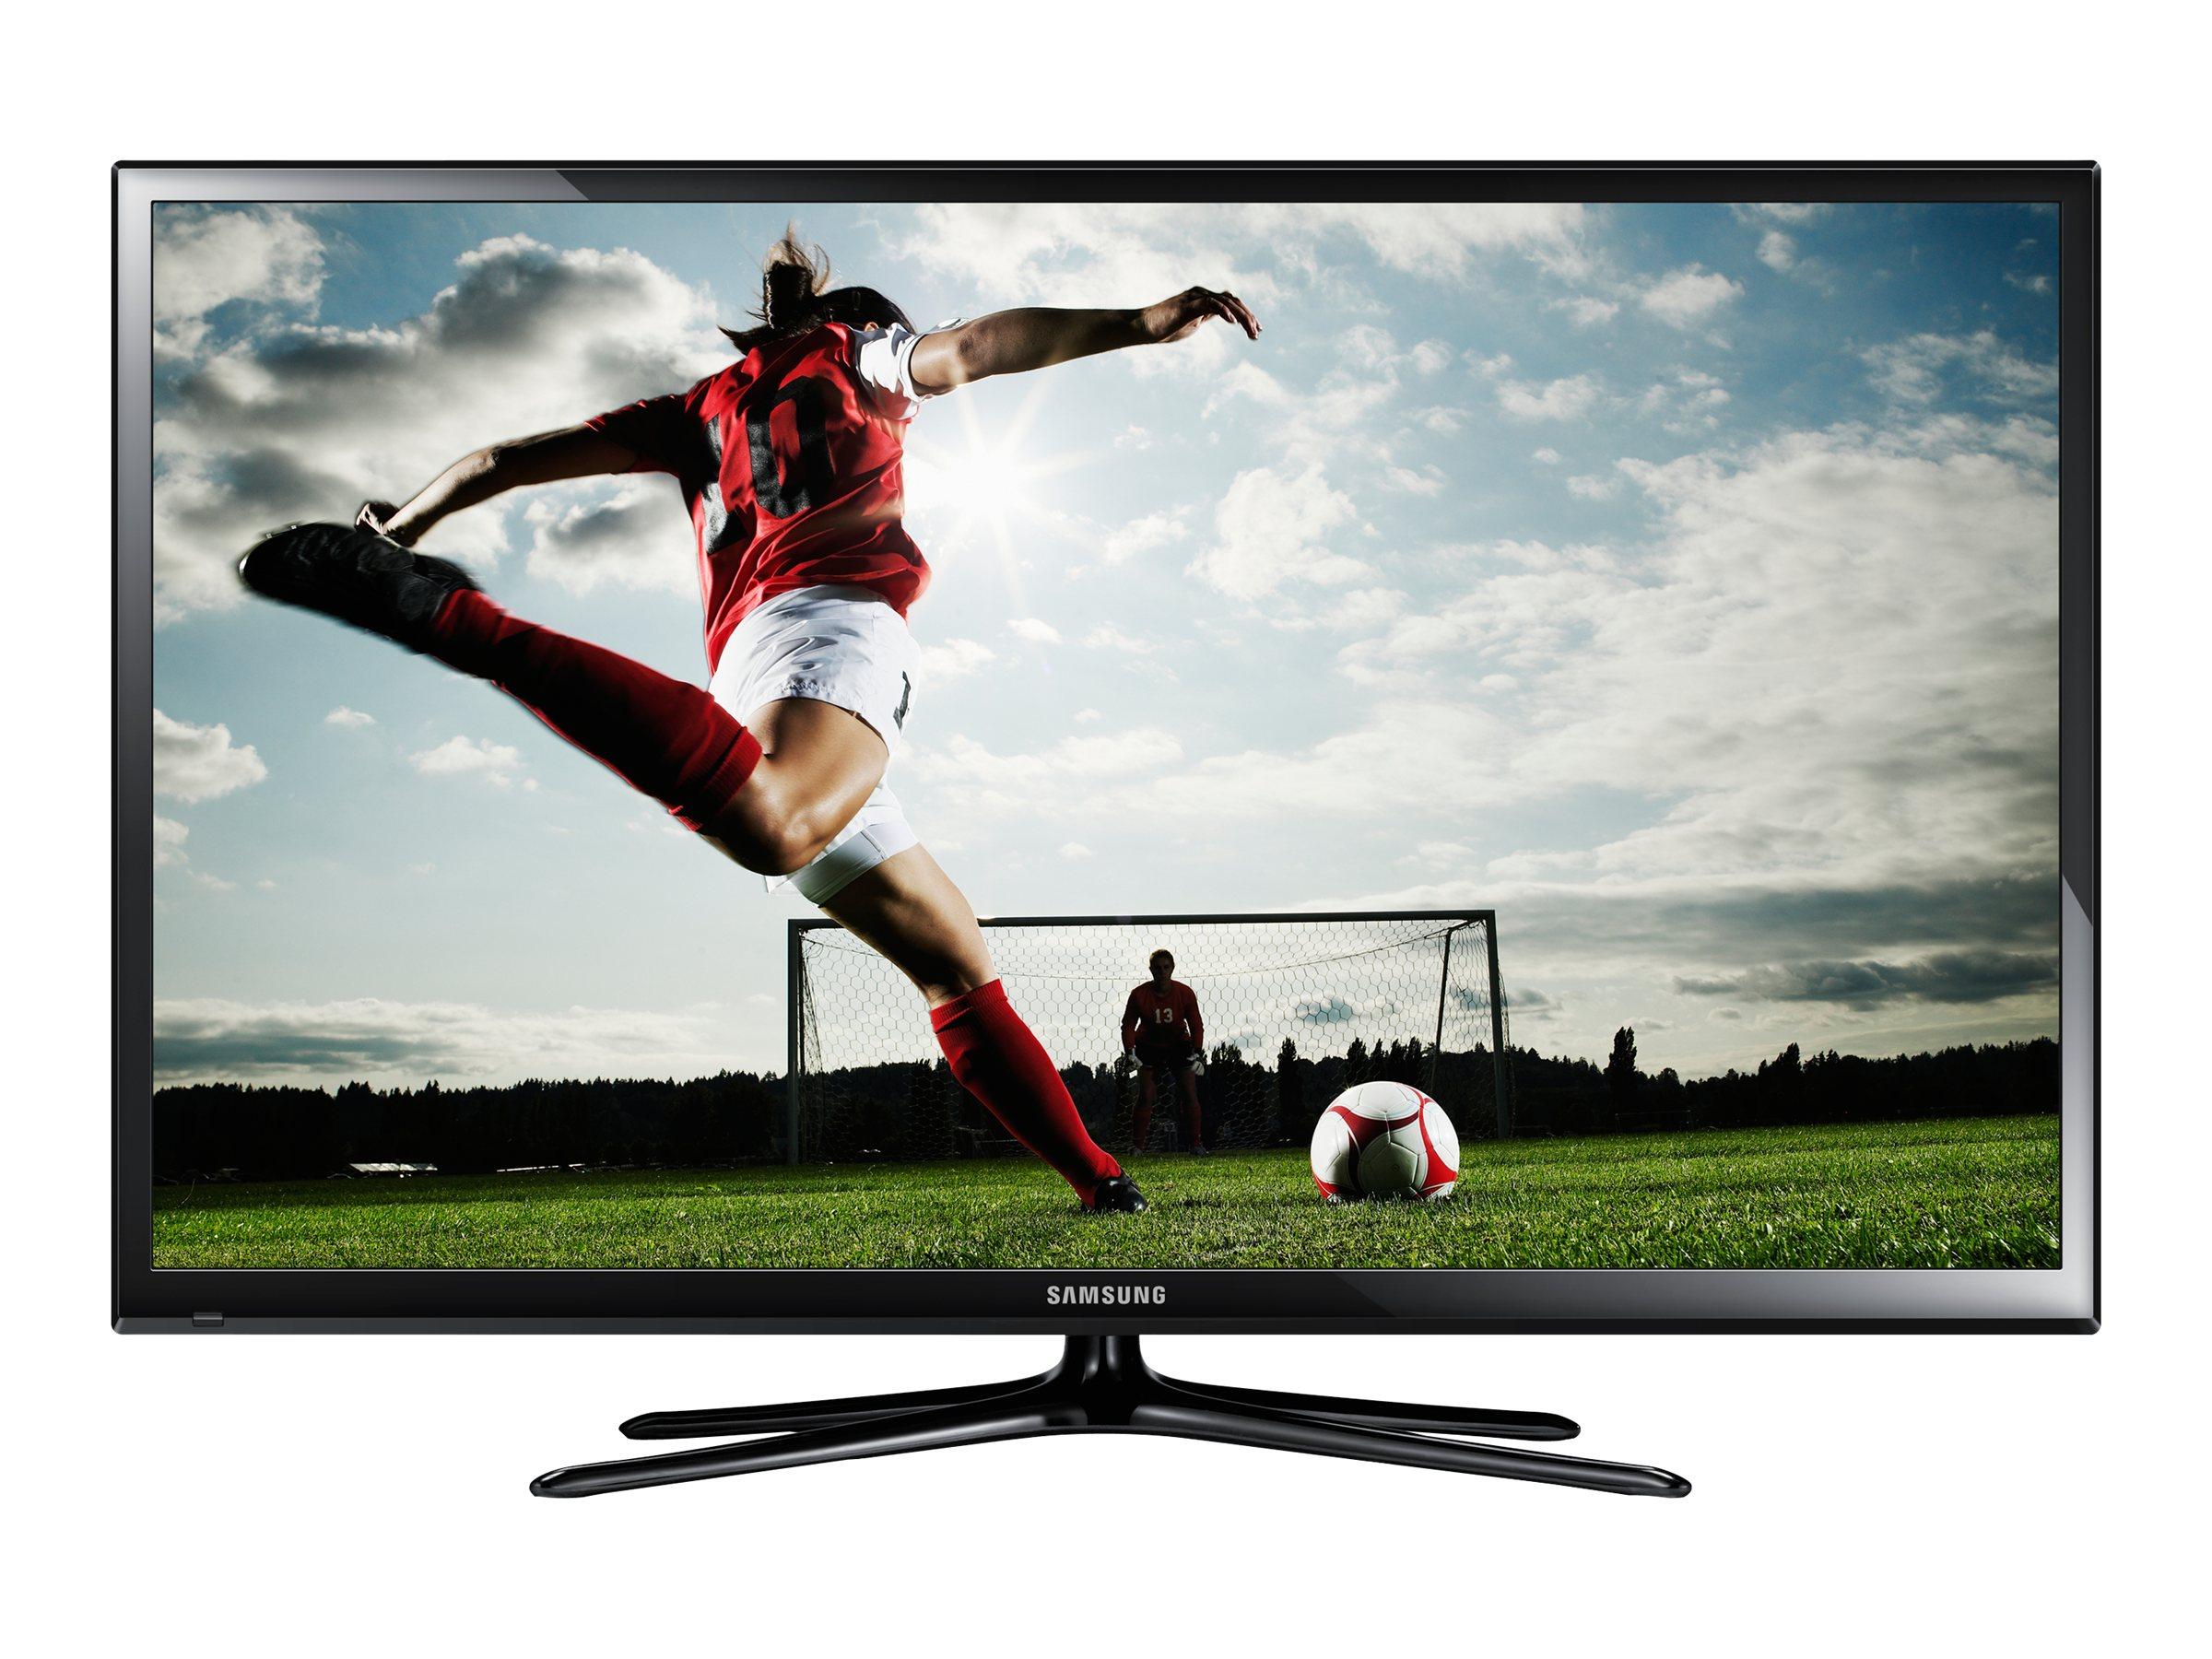 "Samsung 64"" Class 1080p 600Hz Plasma HDTV - PN64F5300AFXZA"